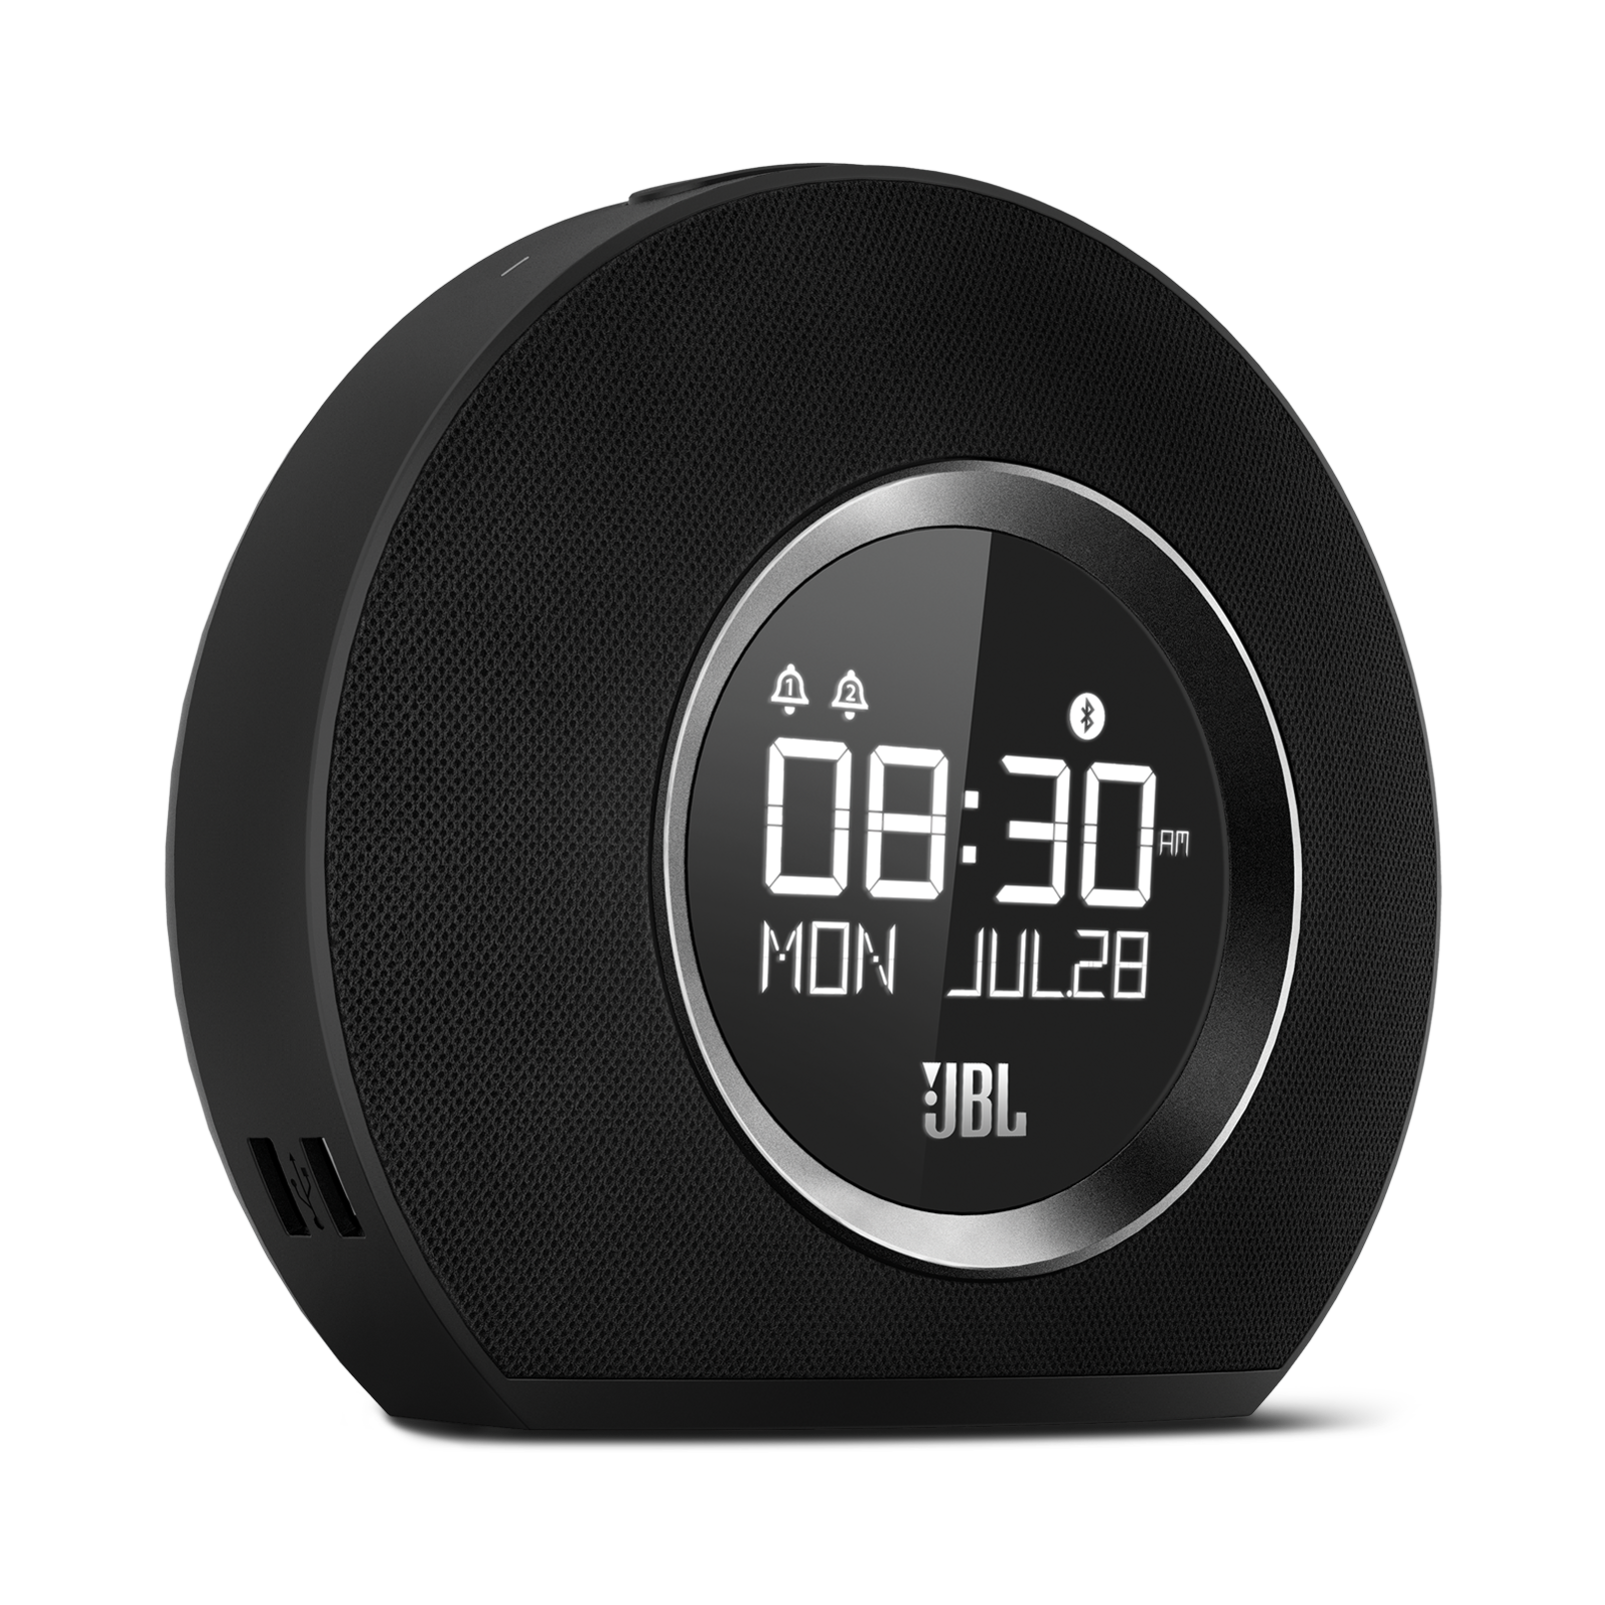 Jbl Horizon Bluetooth Clock Radio With Usb Charging And Ambient Light Shadow Sensor Alarm